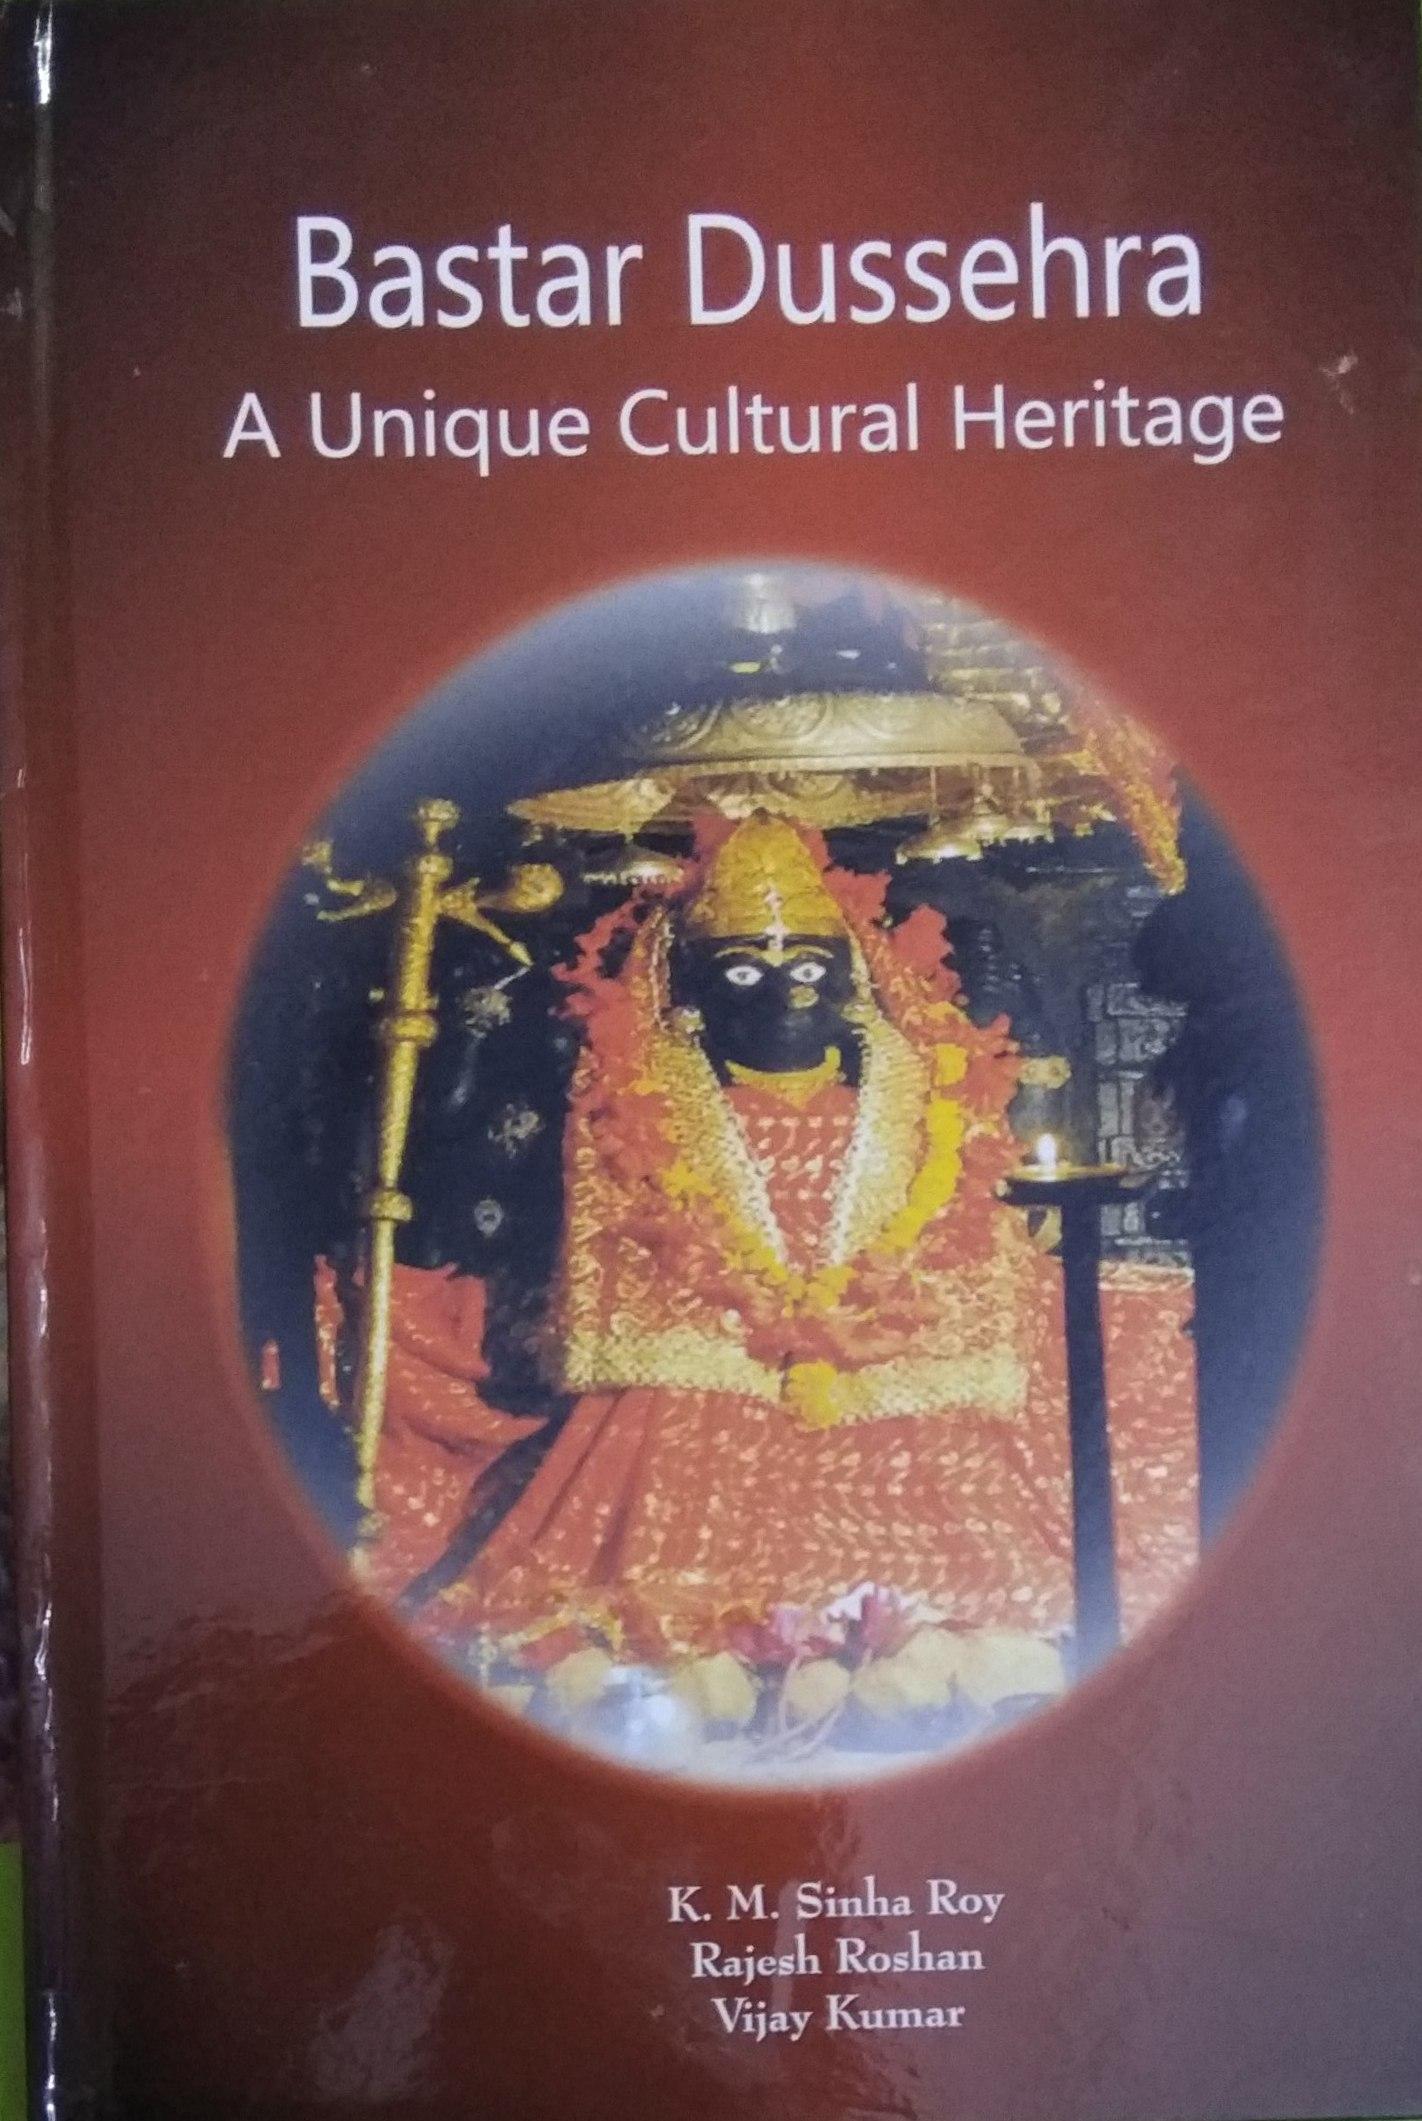 Bastar Dussehra: A Unique Cultural Heritage